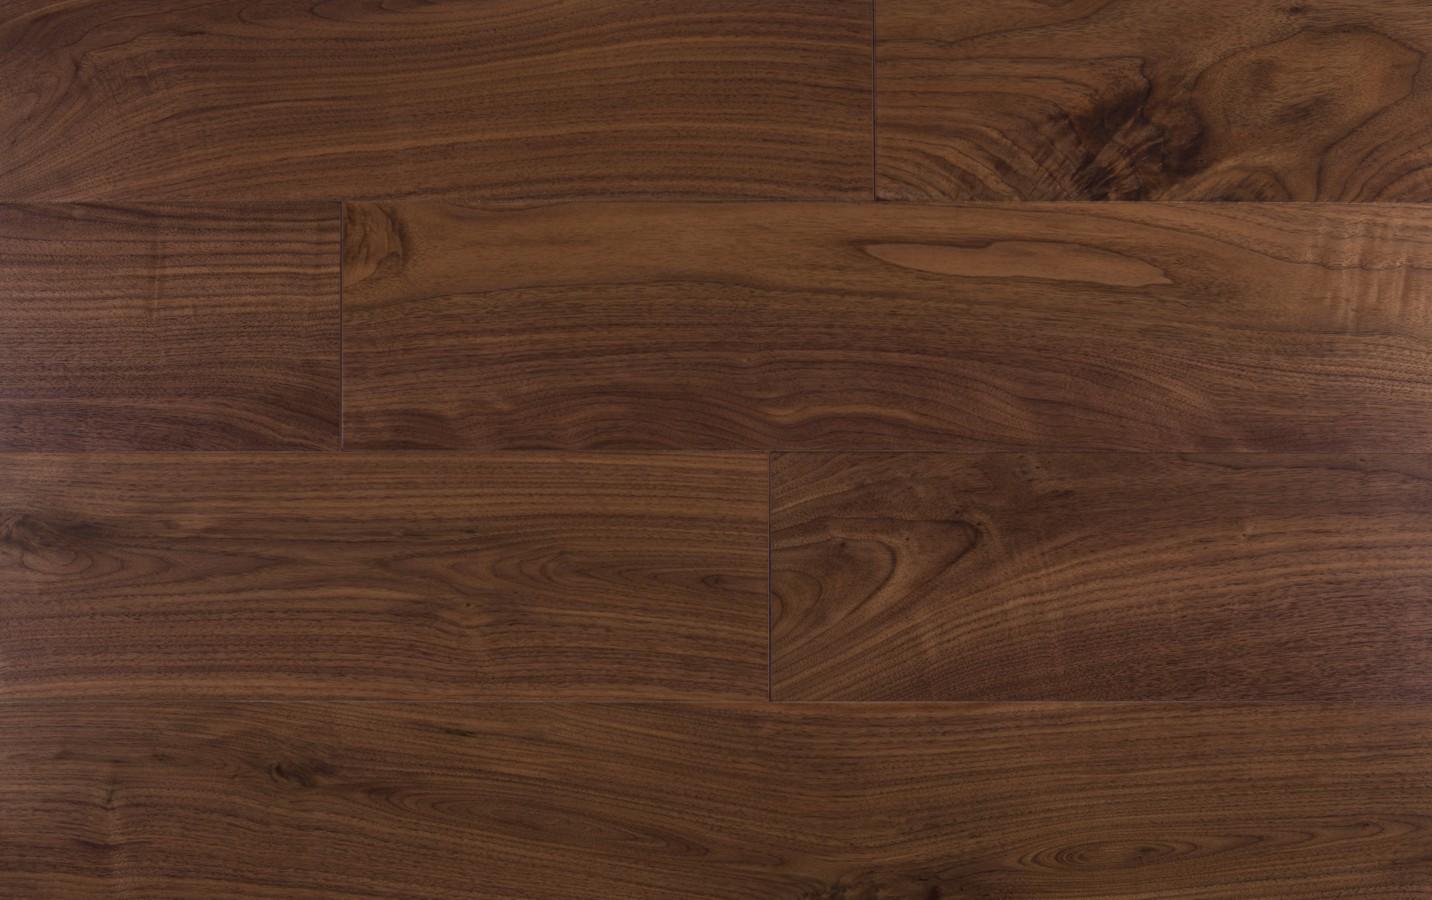 American Walnut, Solid parquet Natur, Varnished 2